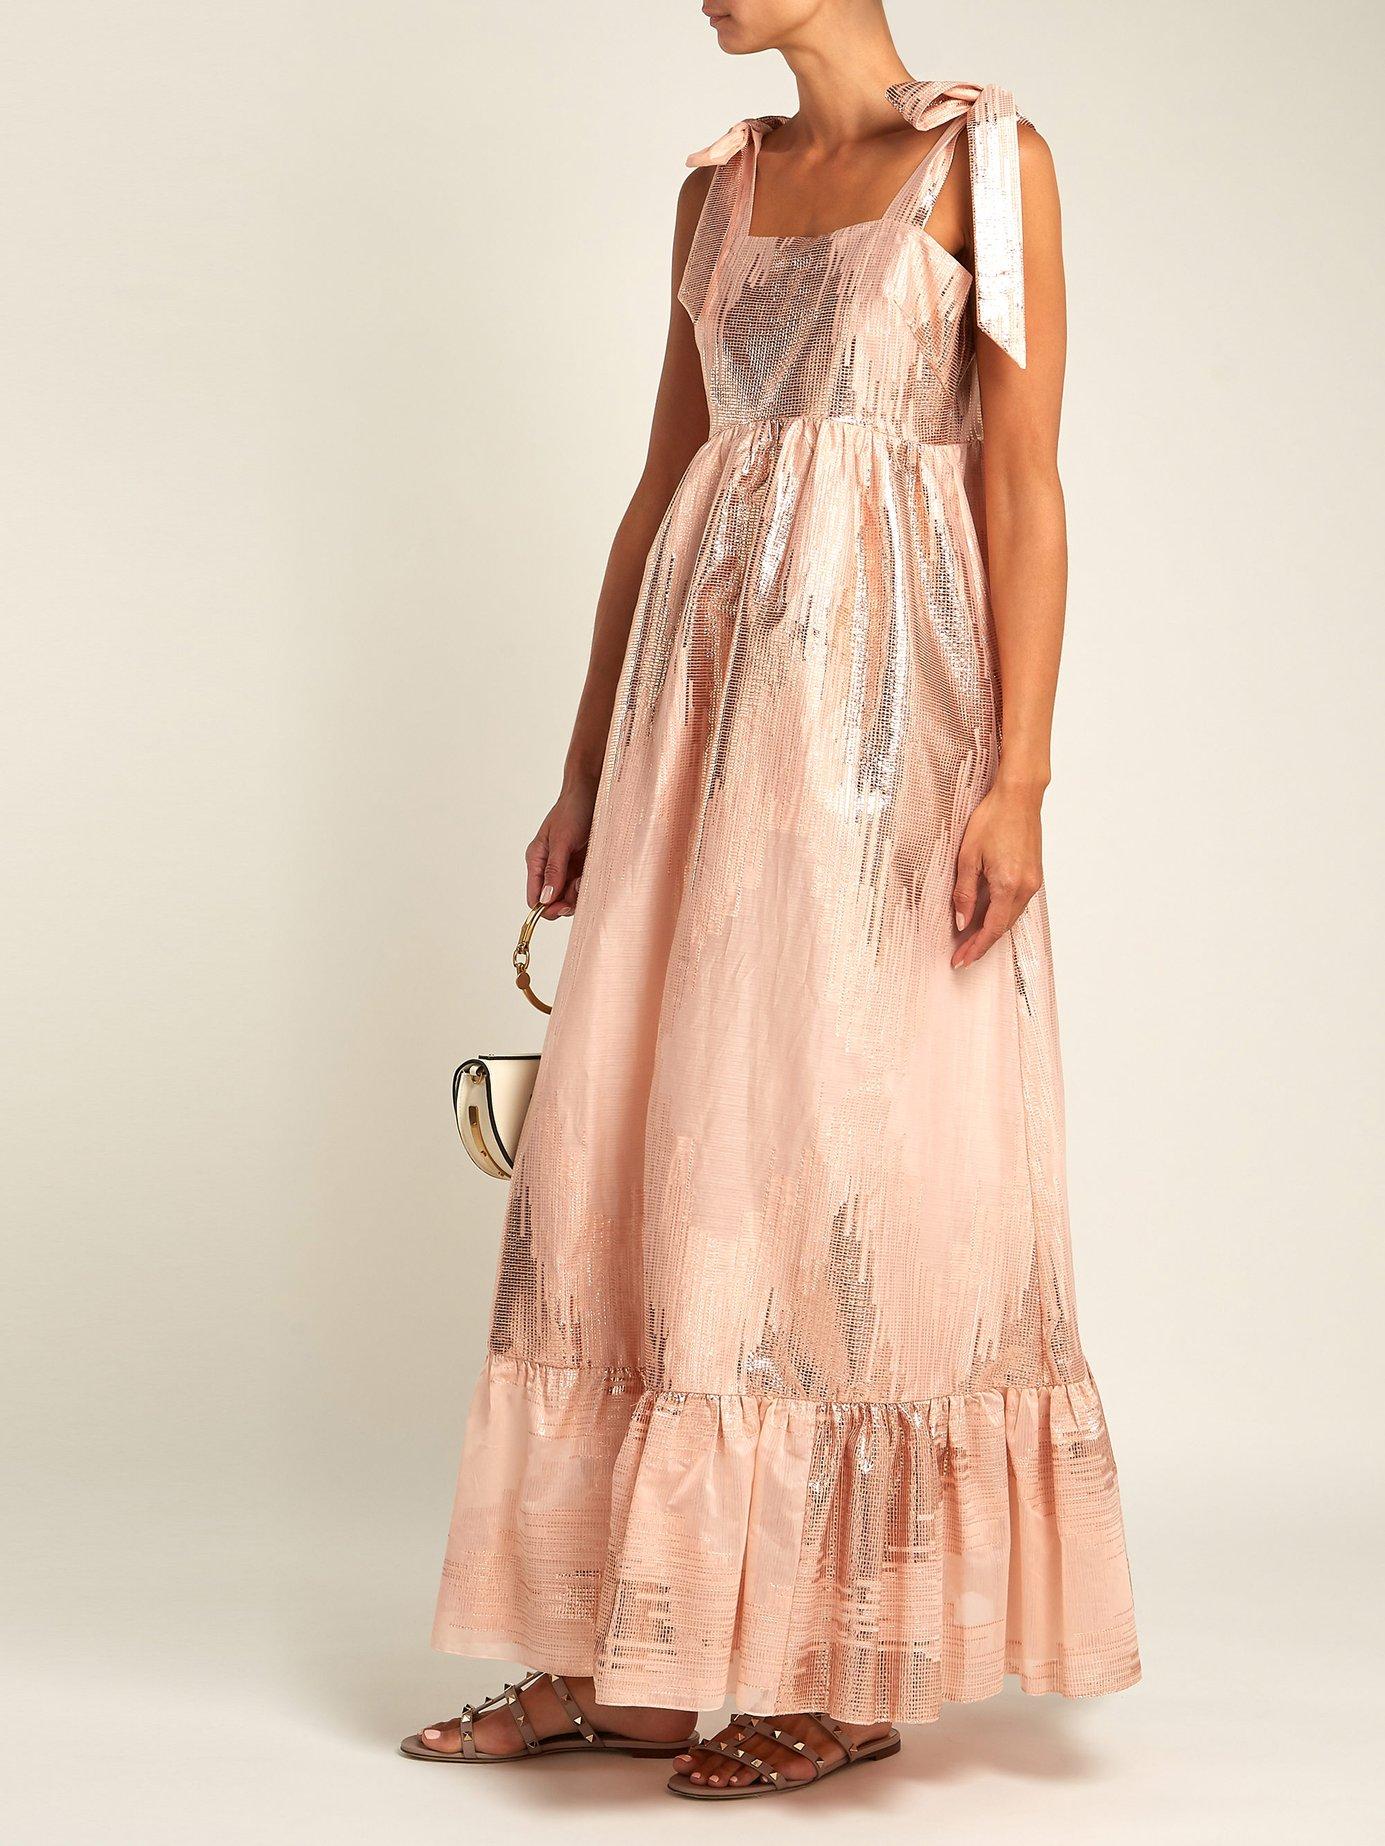 Gold Dust metallic-weave dress by Athena Procopiou